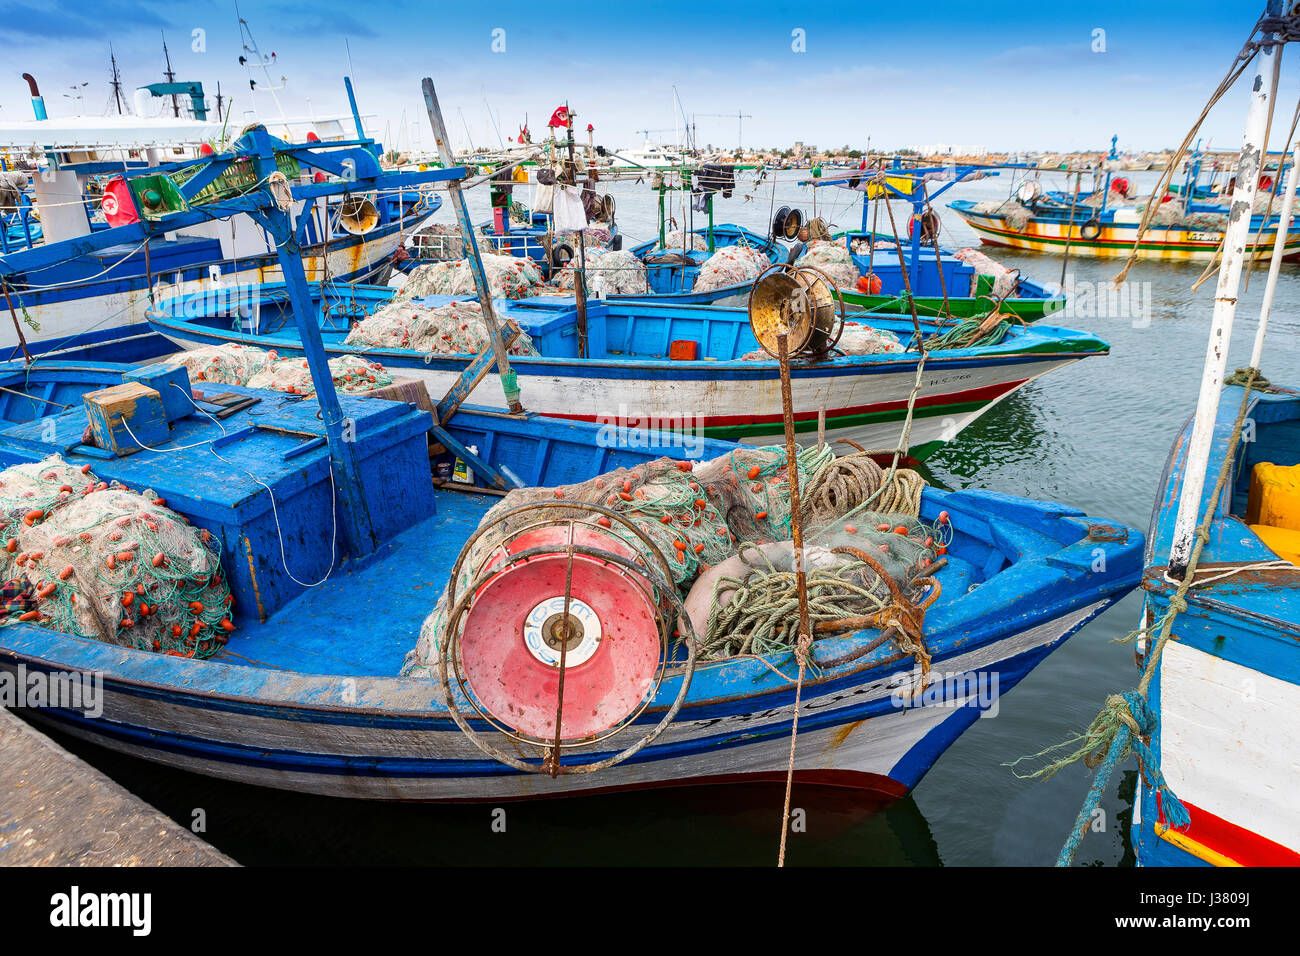 Traditional fishing boat in rHoumt Souk, Marina, Tunisia, fishing boats, Djerba island, - Stock Image